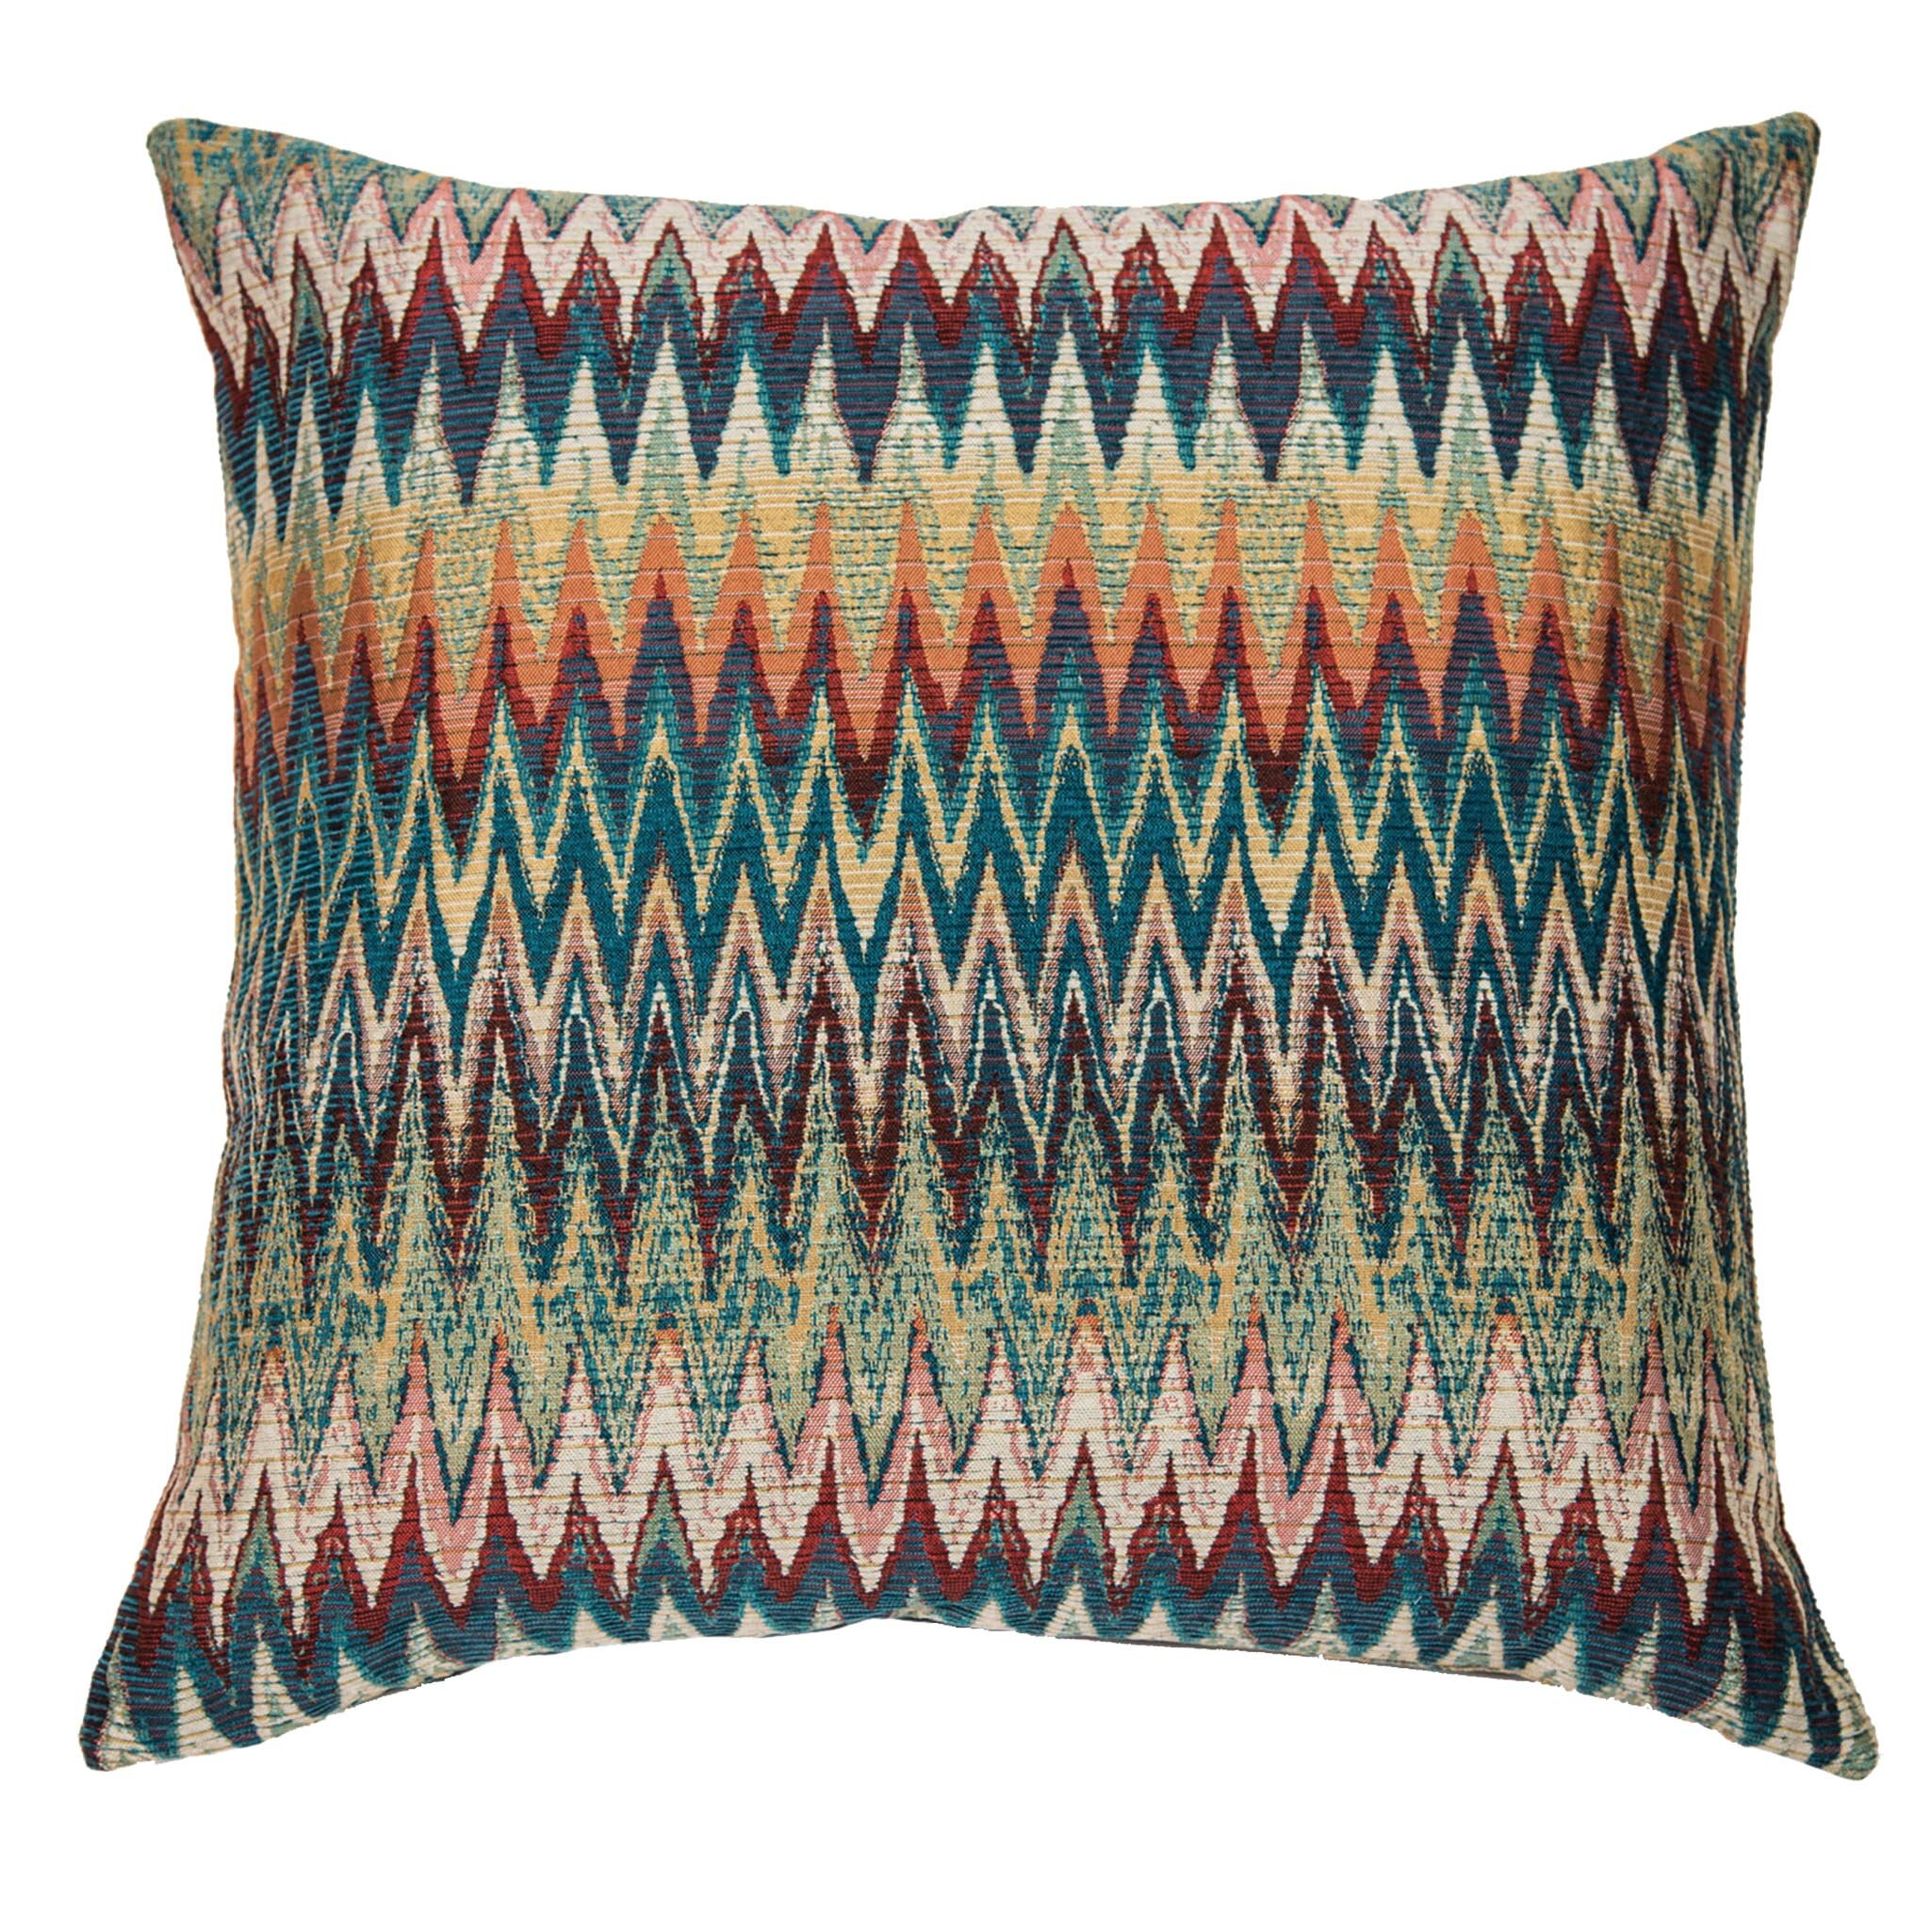 Throw Pillows Matching Curtains : Michael Amini Maui Throw Pillow Wayfair